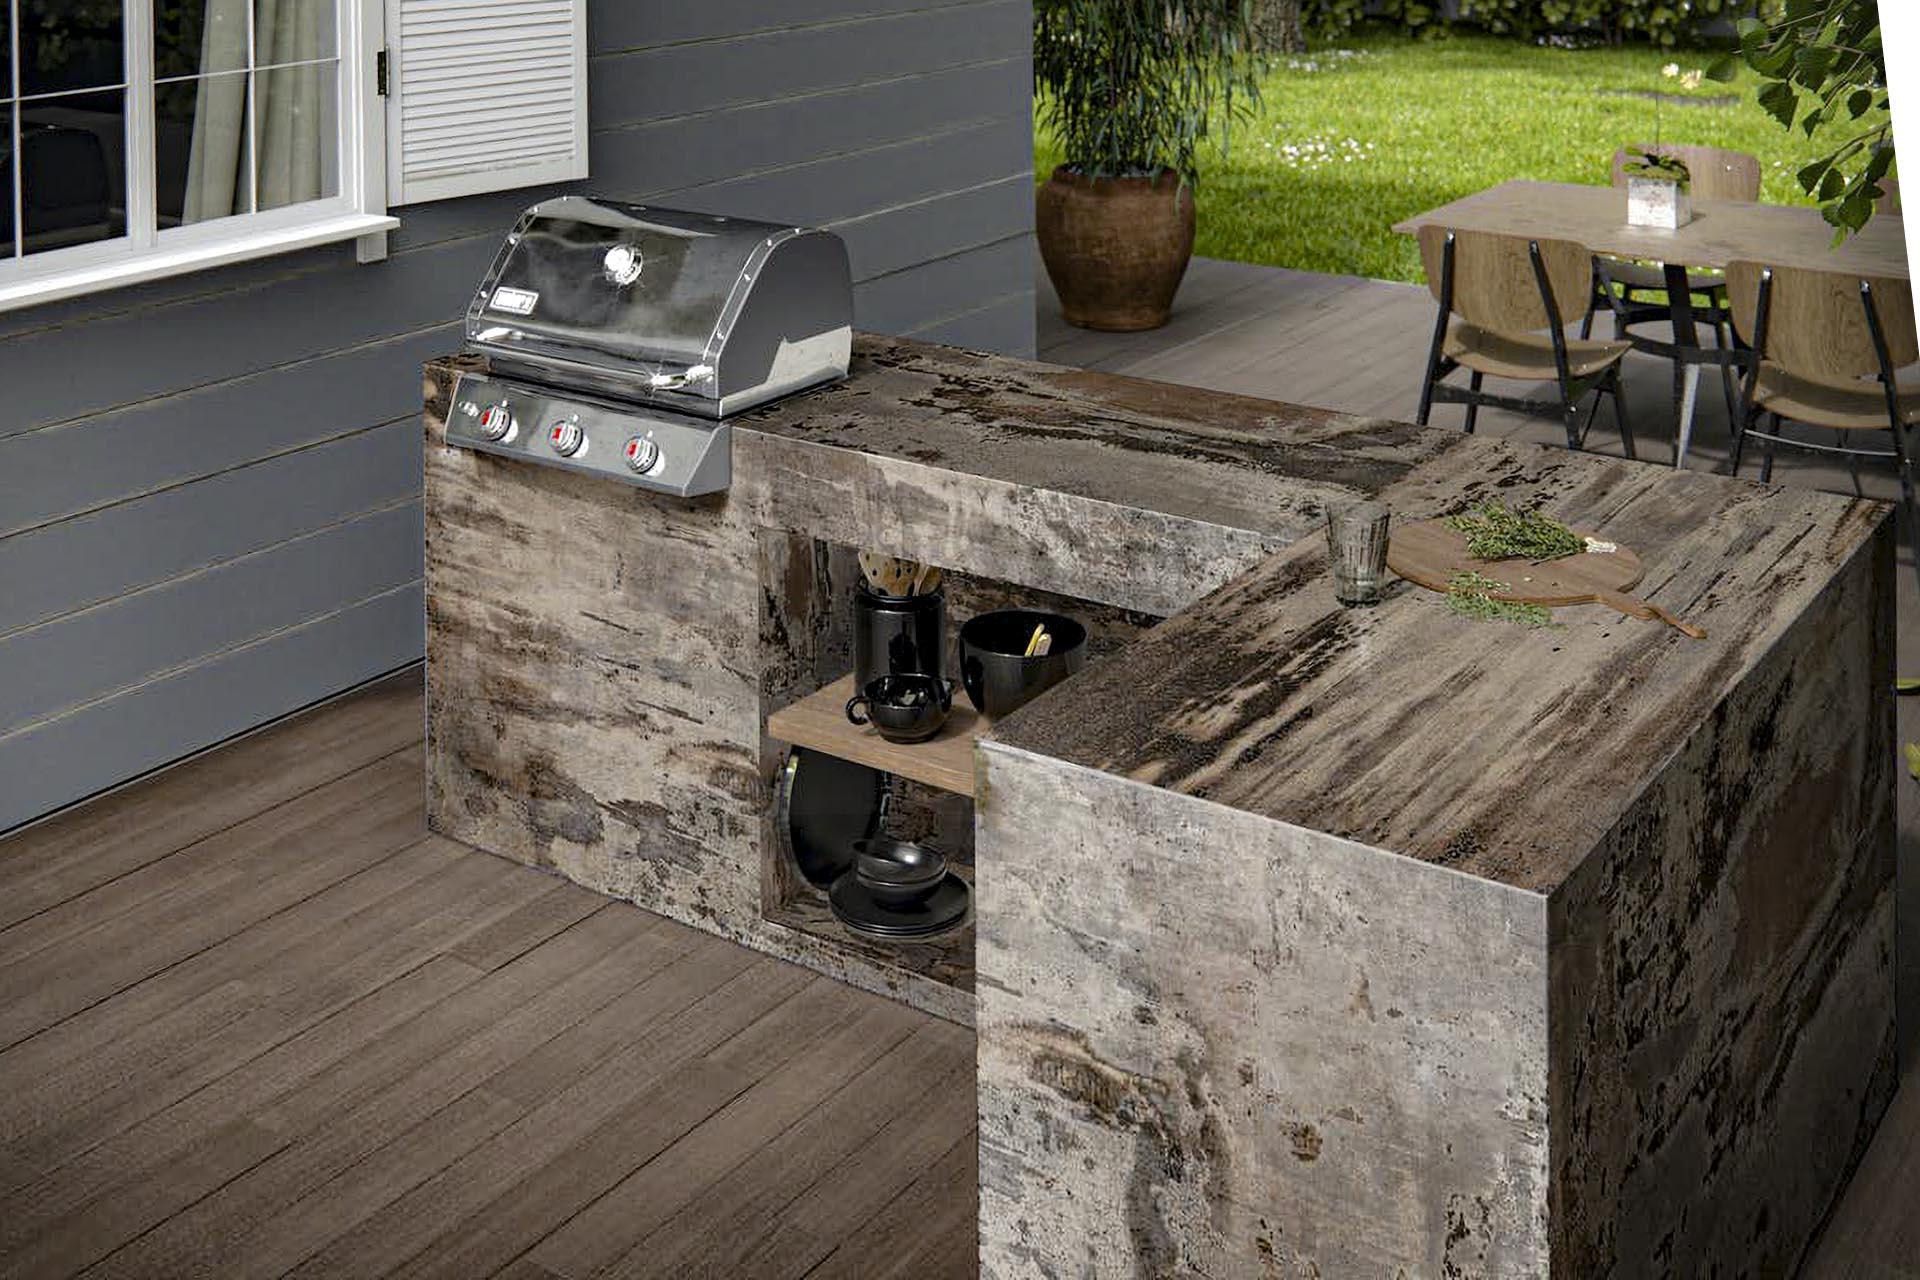 dekton outdoor kitchen worktops barbecue Computer graphics image trilium